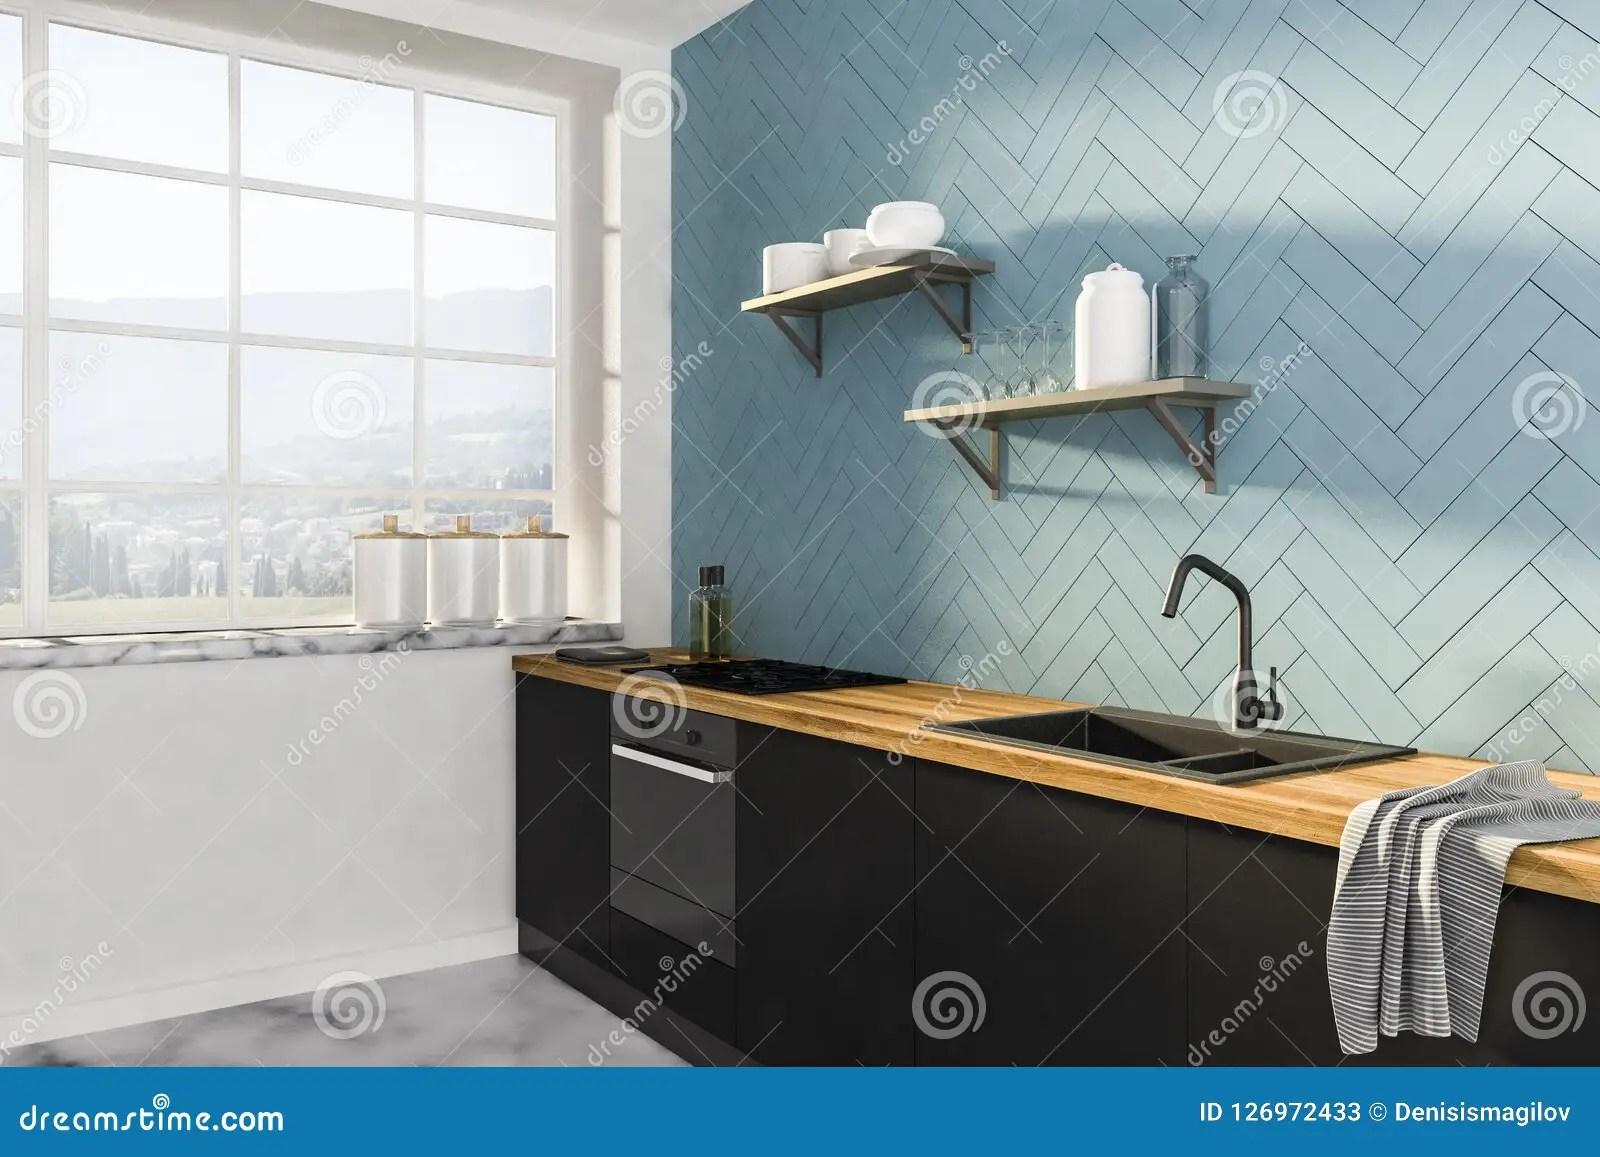 grey kitchen countertops white island with butcher block top 与黑工作台面的灰色厨房角落库存例证 插画包括有国内 计数器 建筑 与黑工作台面的灰色厨房角落